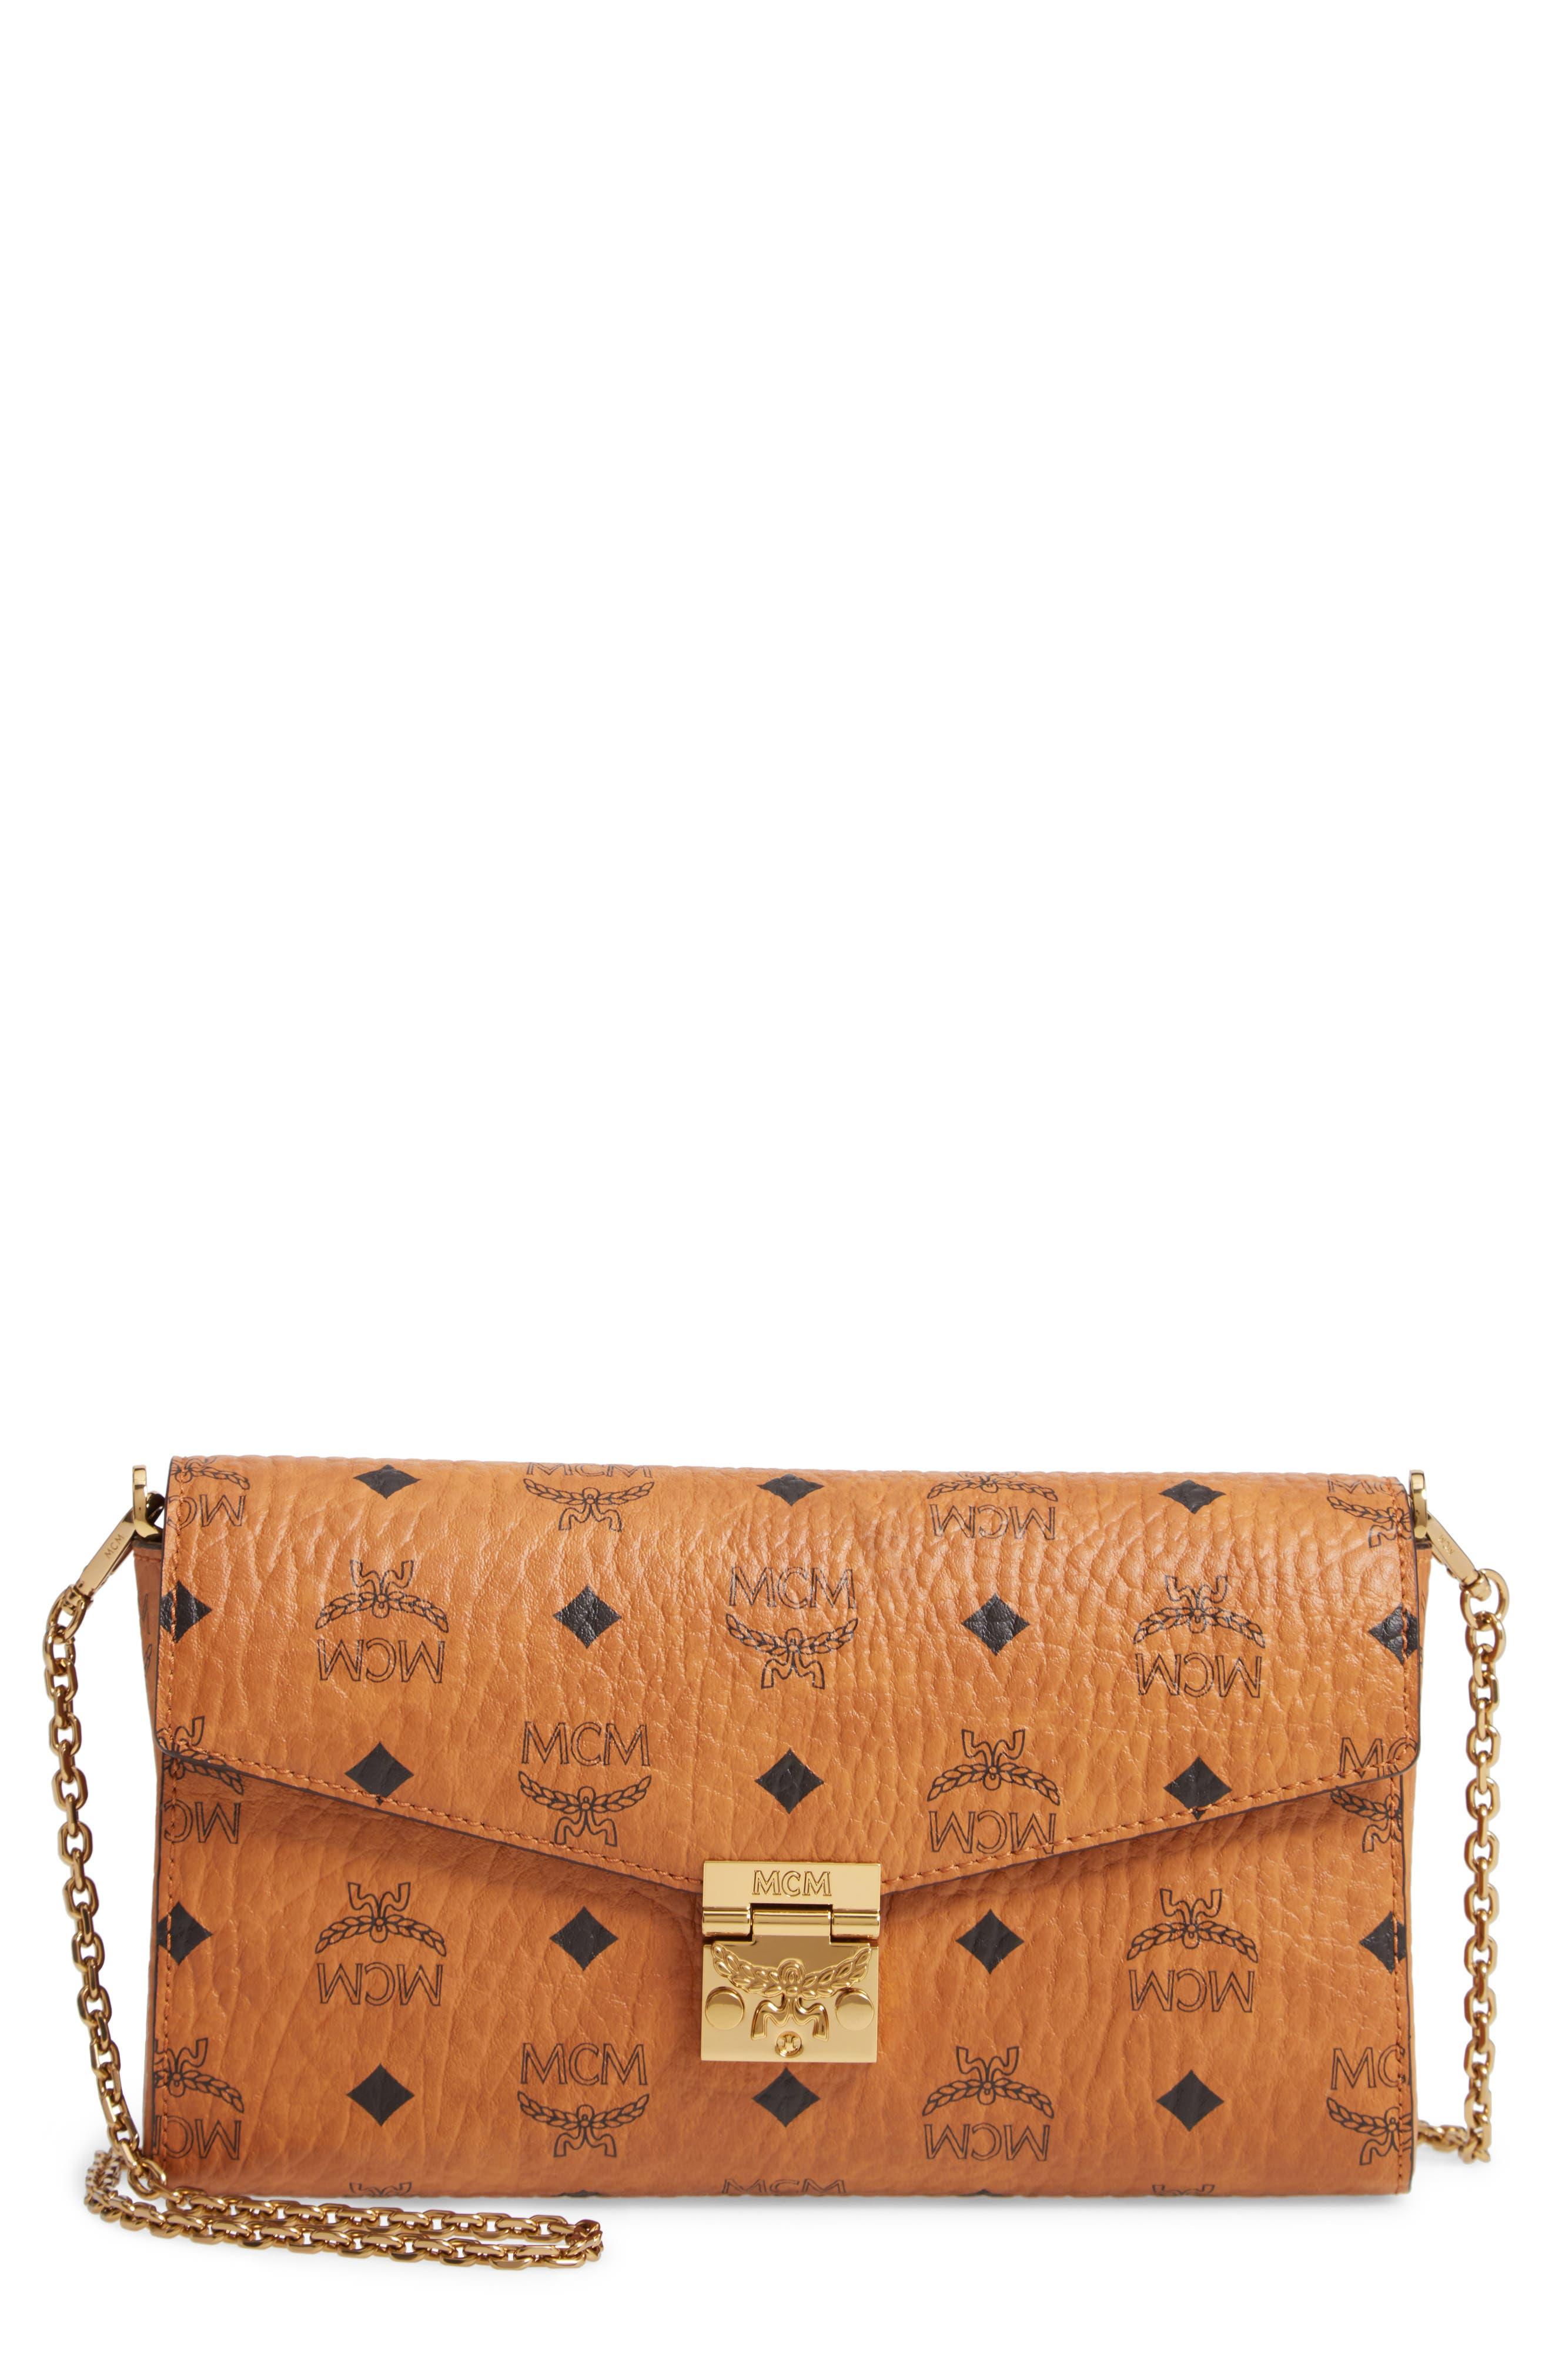 Millie Monogrammed Leather Crossbody Bag,                             Main thumbnail 1, color,                             COGNAC BROWN